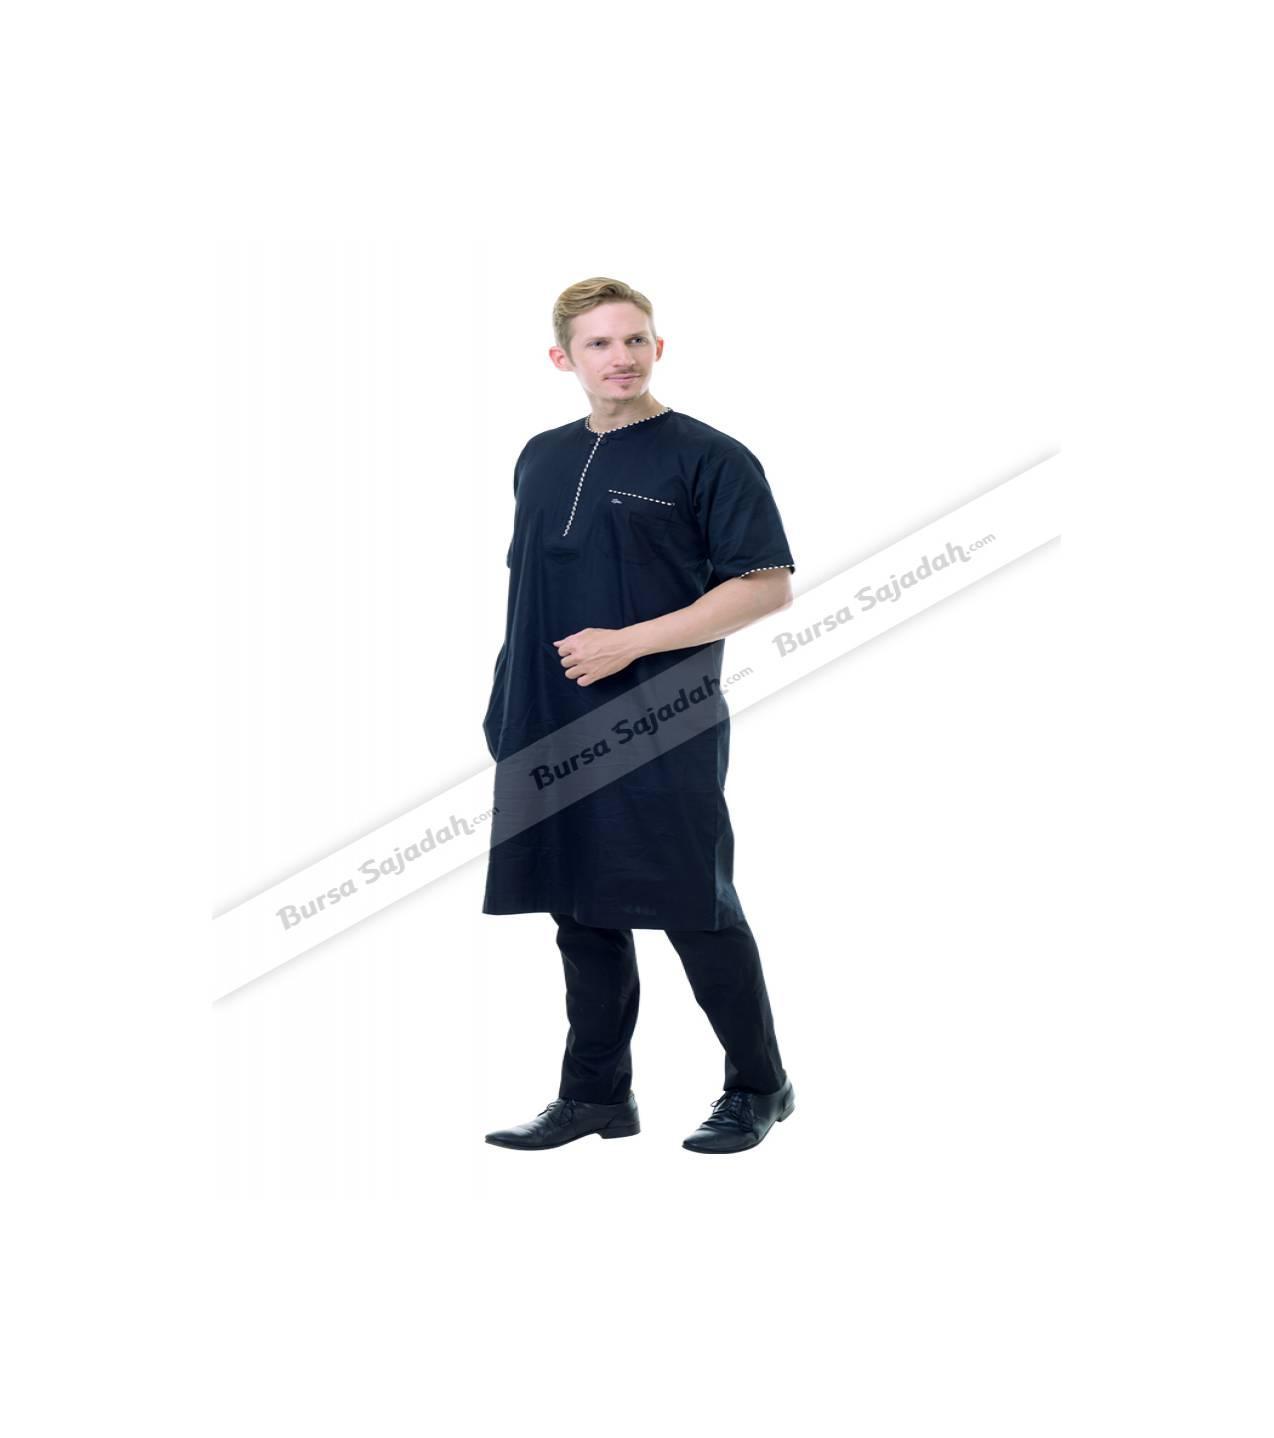 Baju Busana Koko Muslim Gamis Pendek Garis Laki laki - Afkhar Zaleera